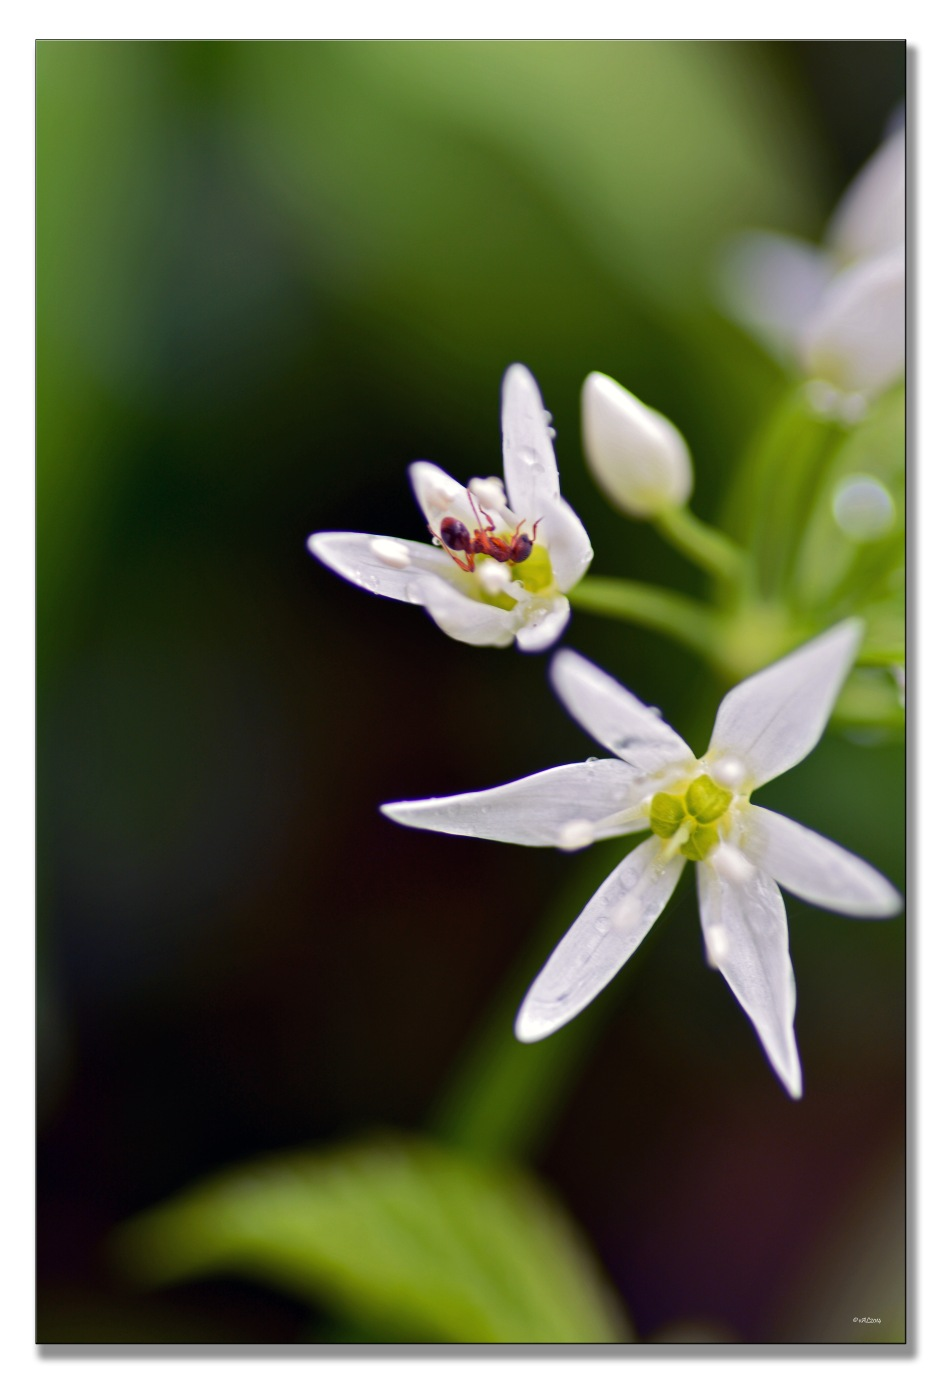 fourmi en coeur de fleur